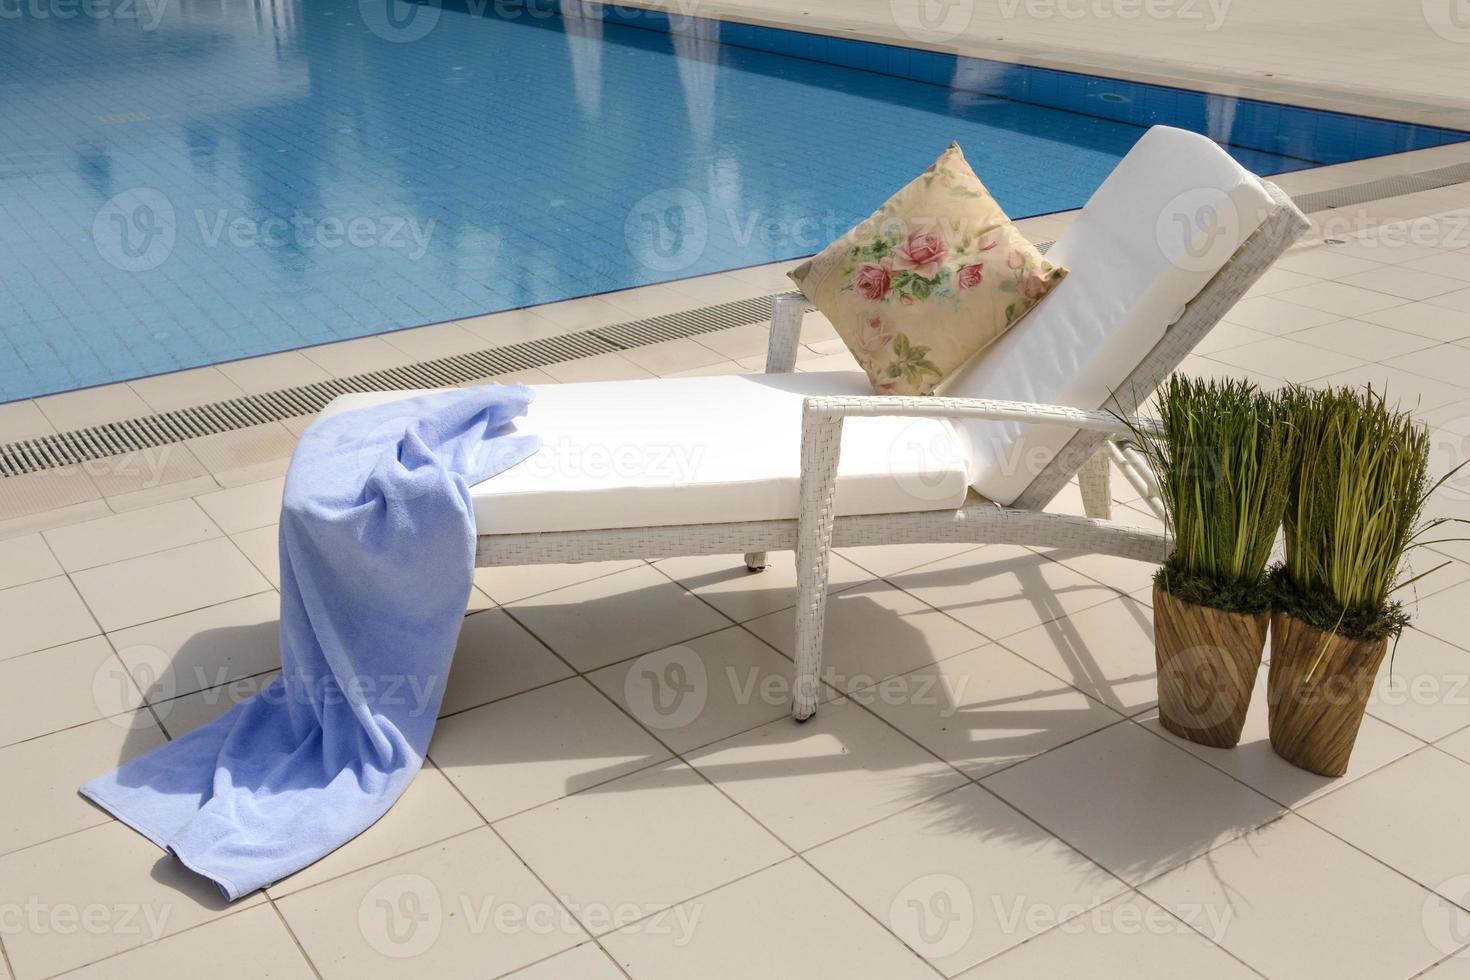 tumbona junto a la piscina en un hotel de lujo foto